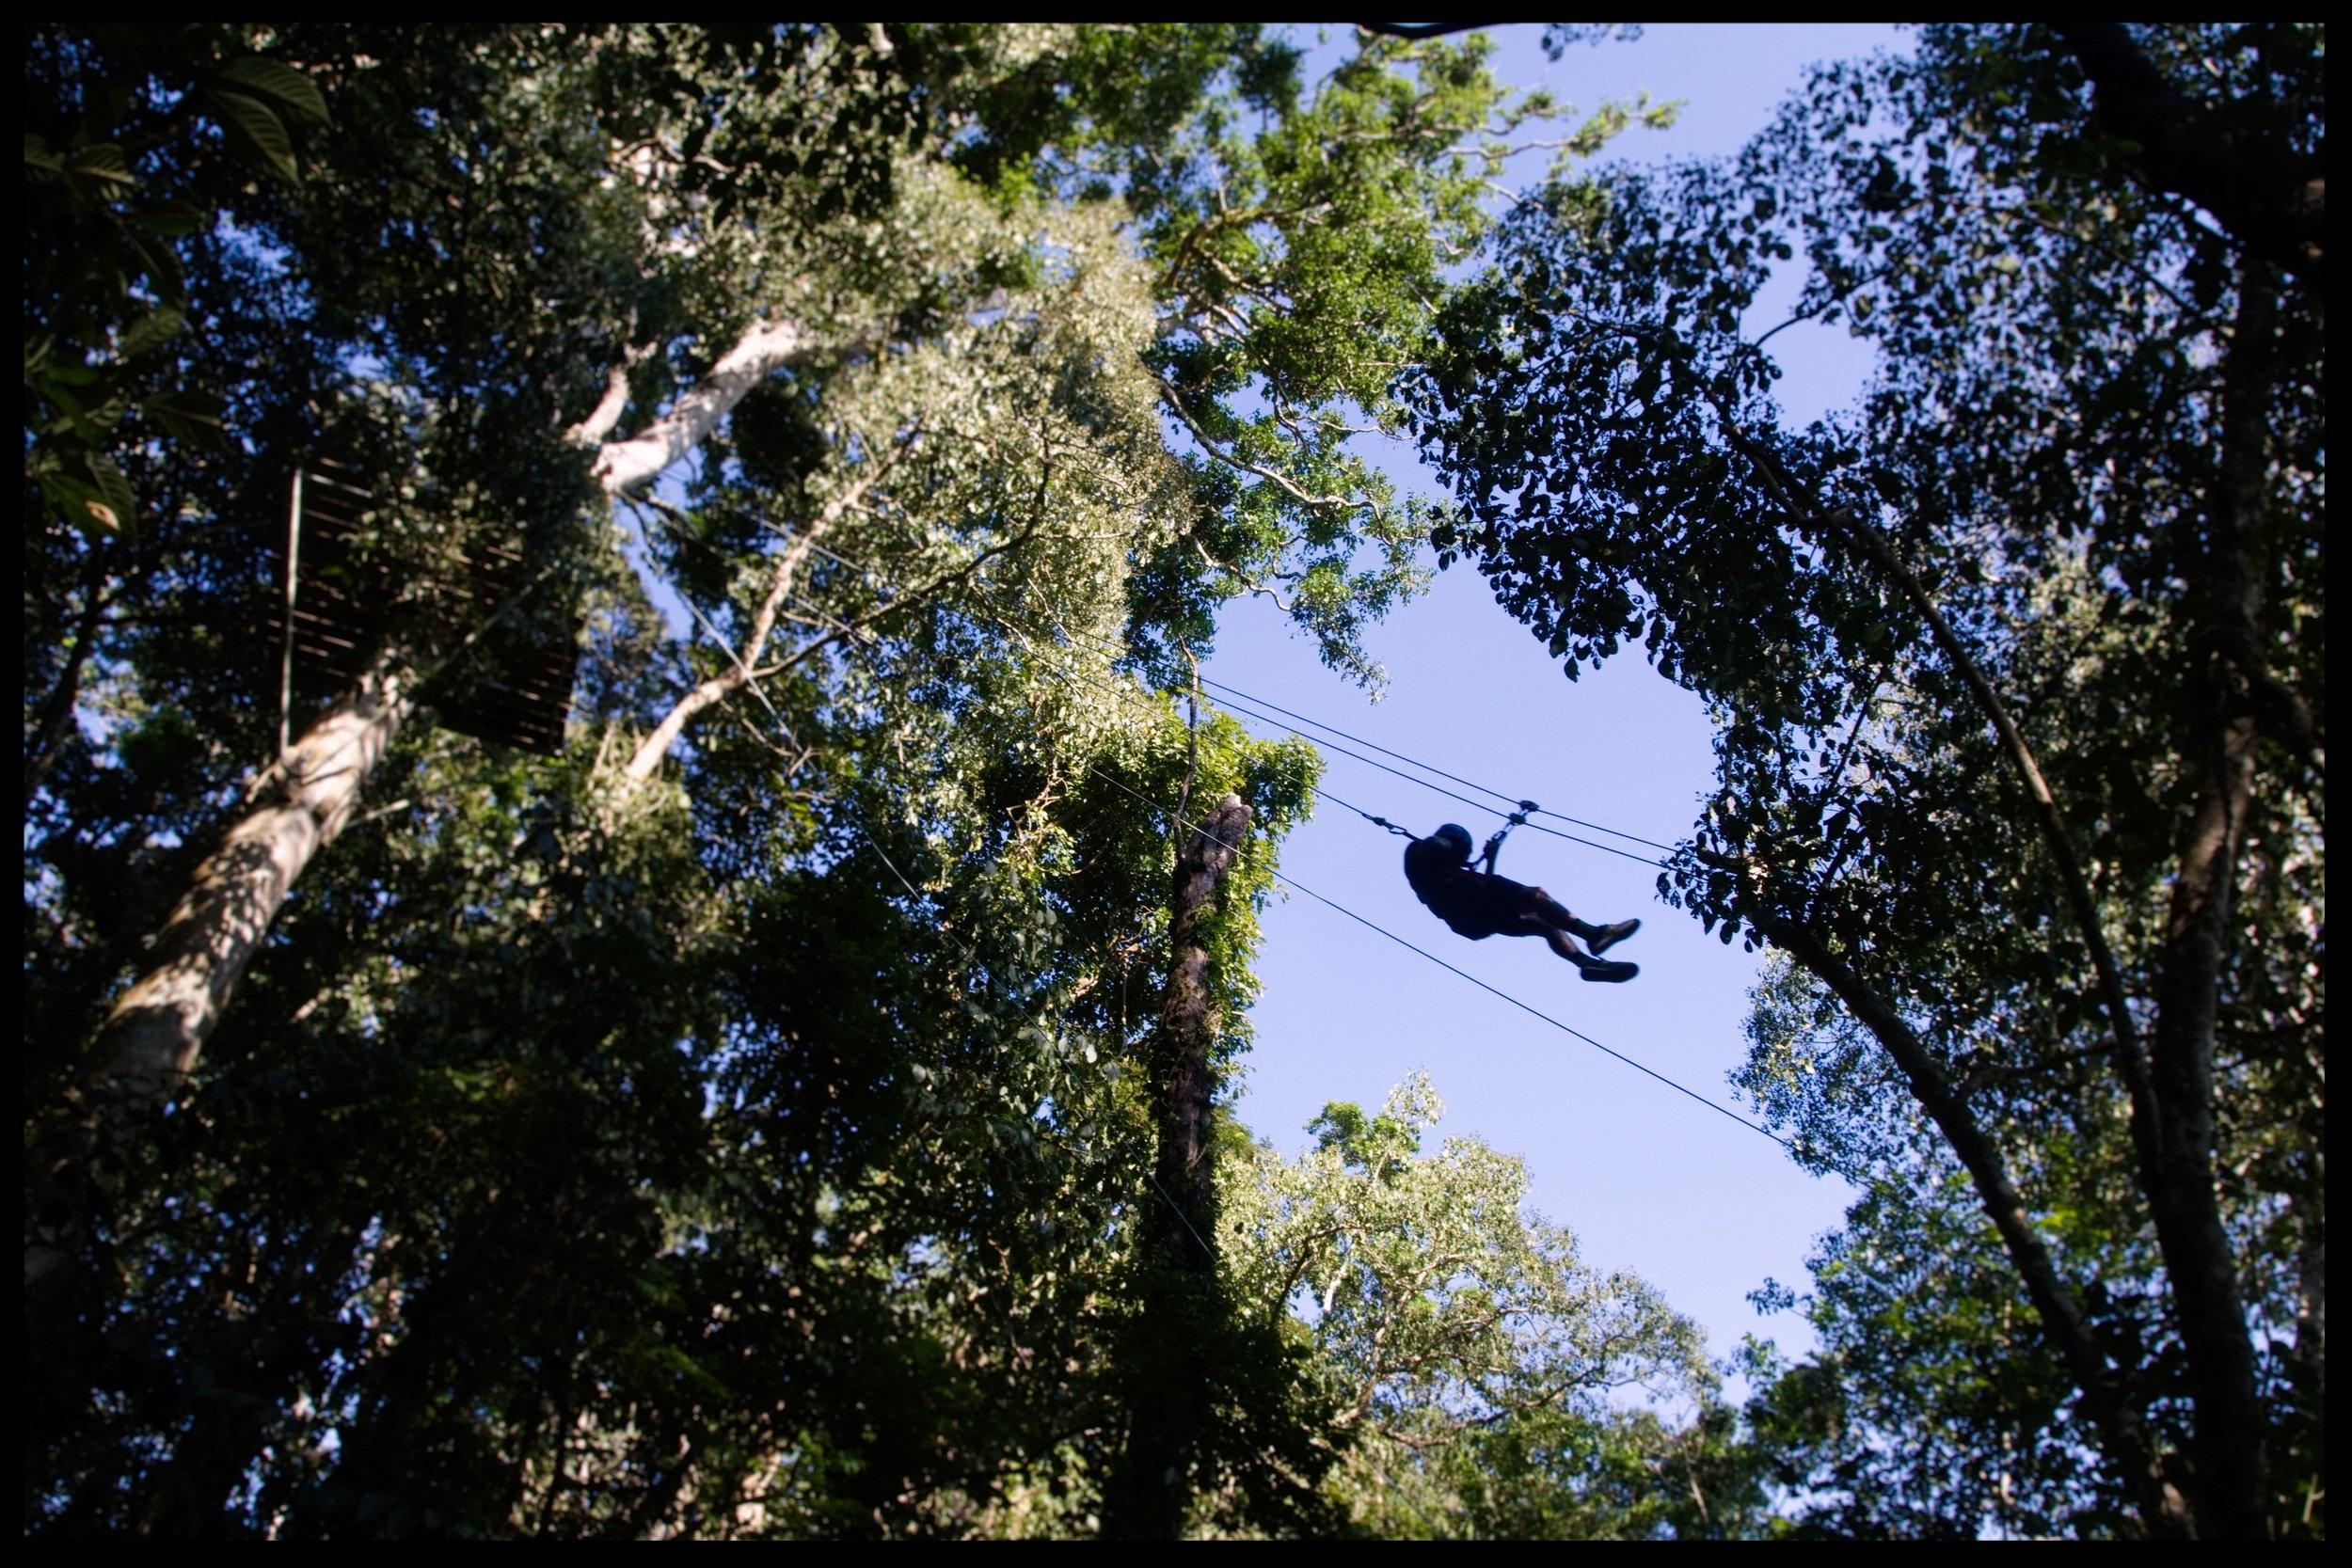 A guest zip-lining at Parque de Aventura Las Nubes, located on the Finca Las Nubes property.  Photo by Michael Mundt